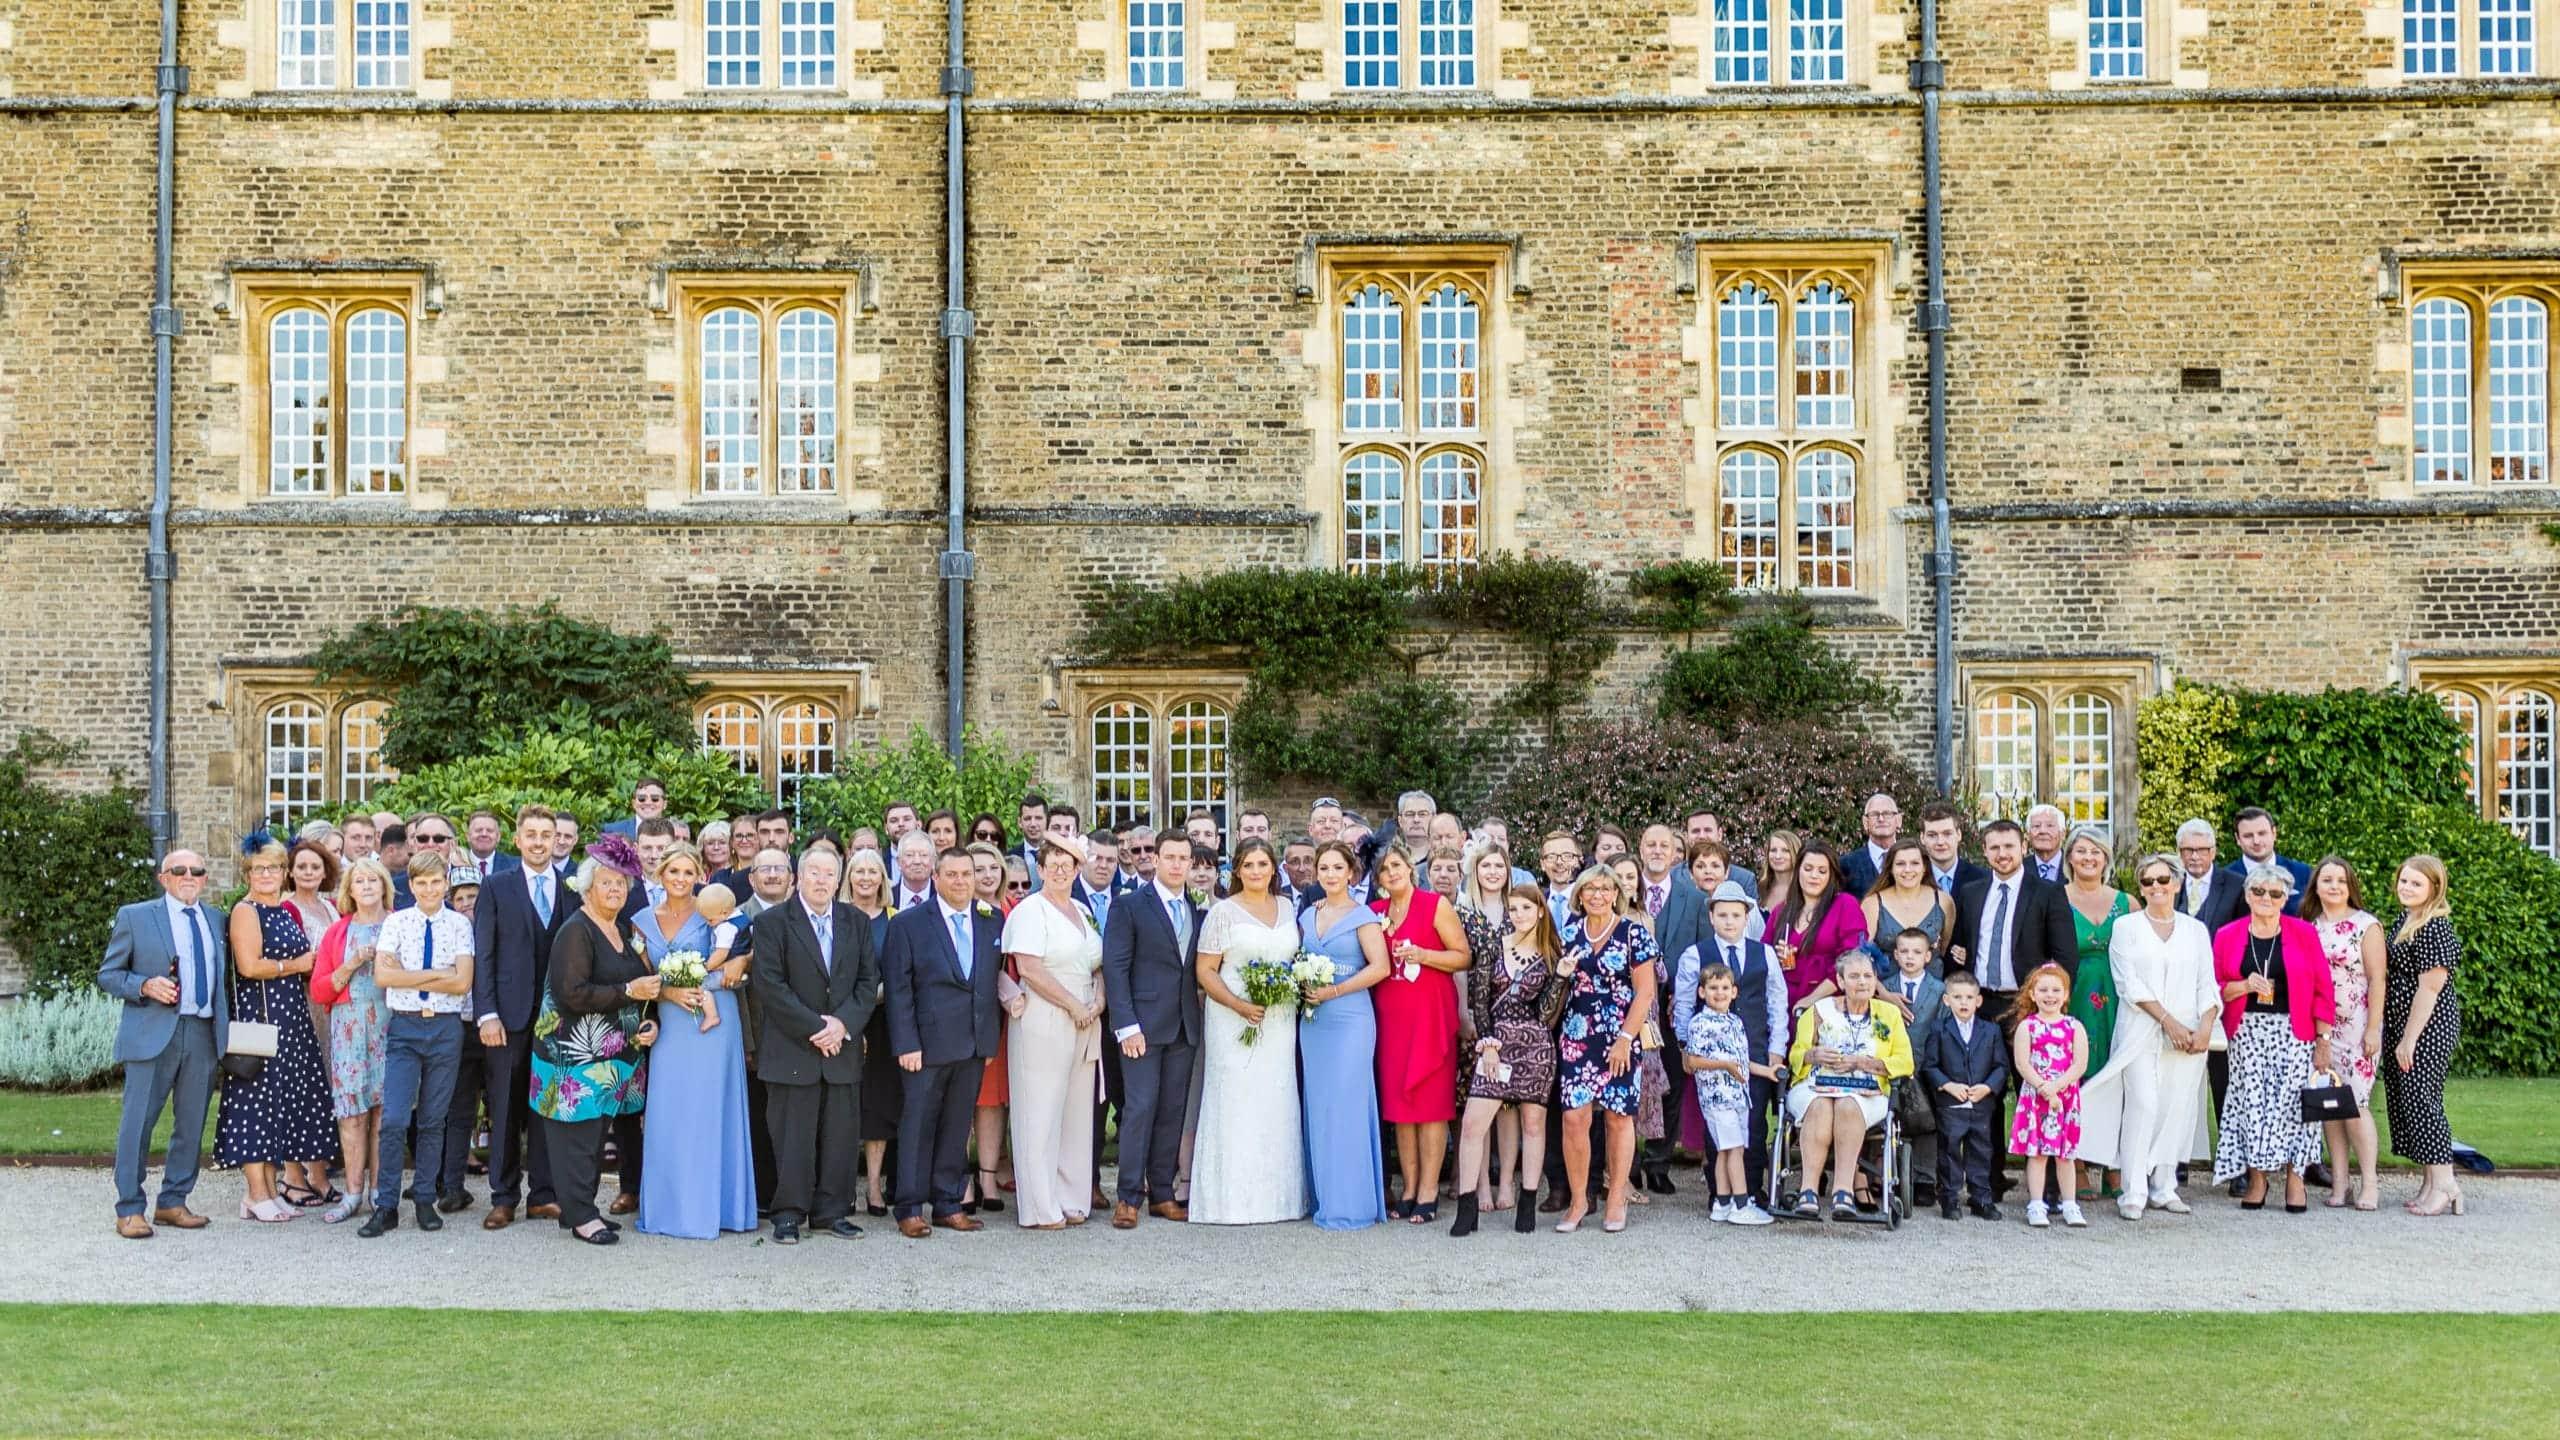 Jesus College Cambridge Wedding - group shot